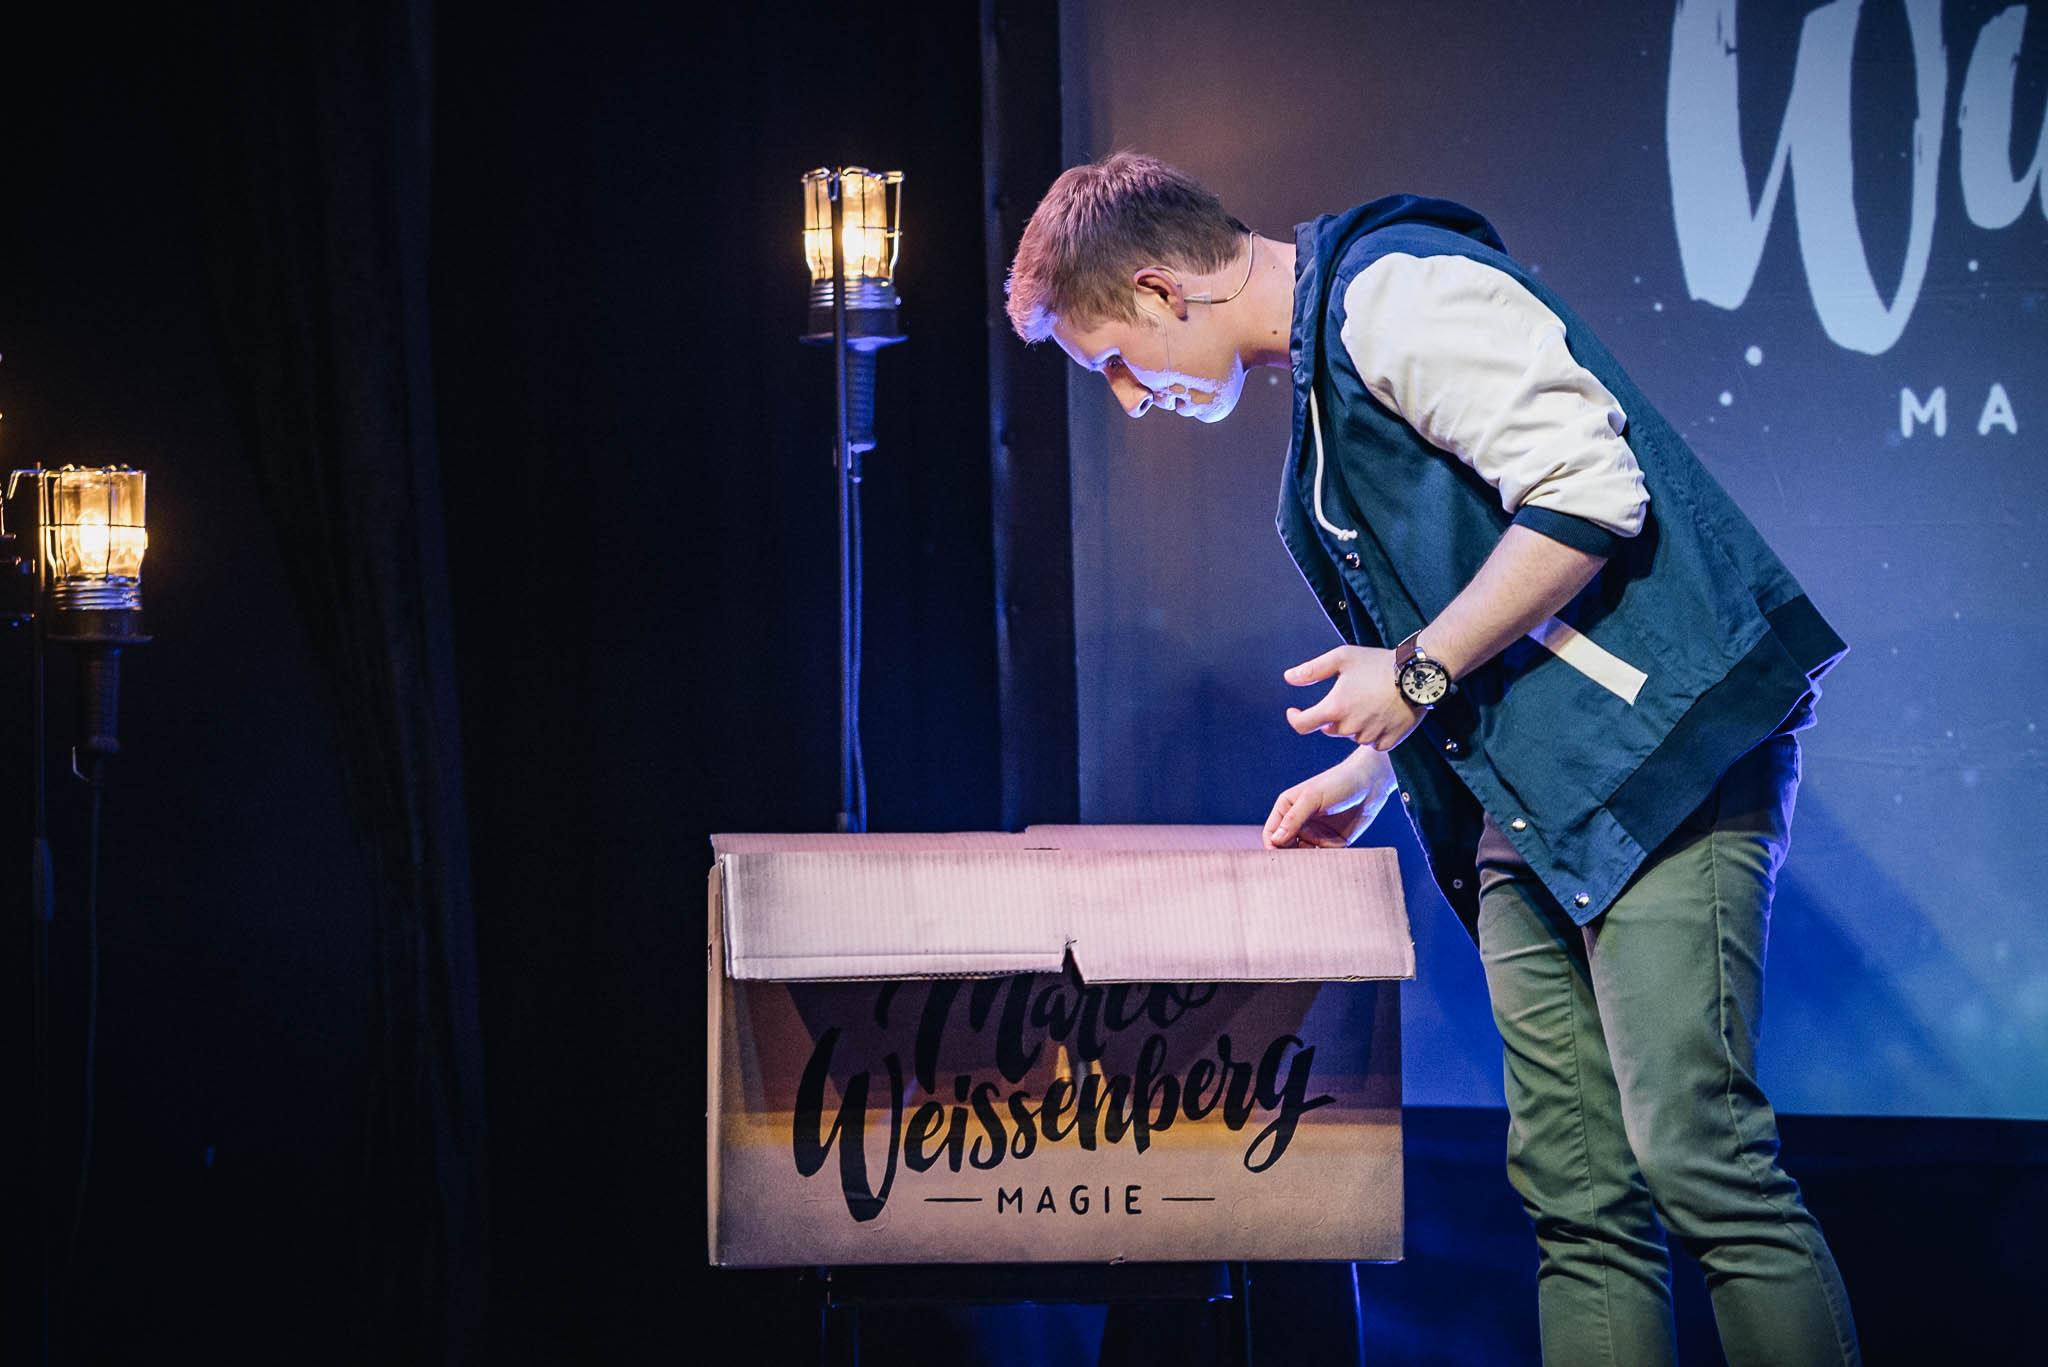 Eventtechnik Marco Weissenberg Wunderkind Show